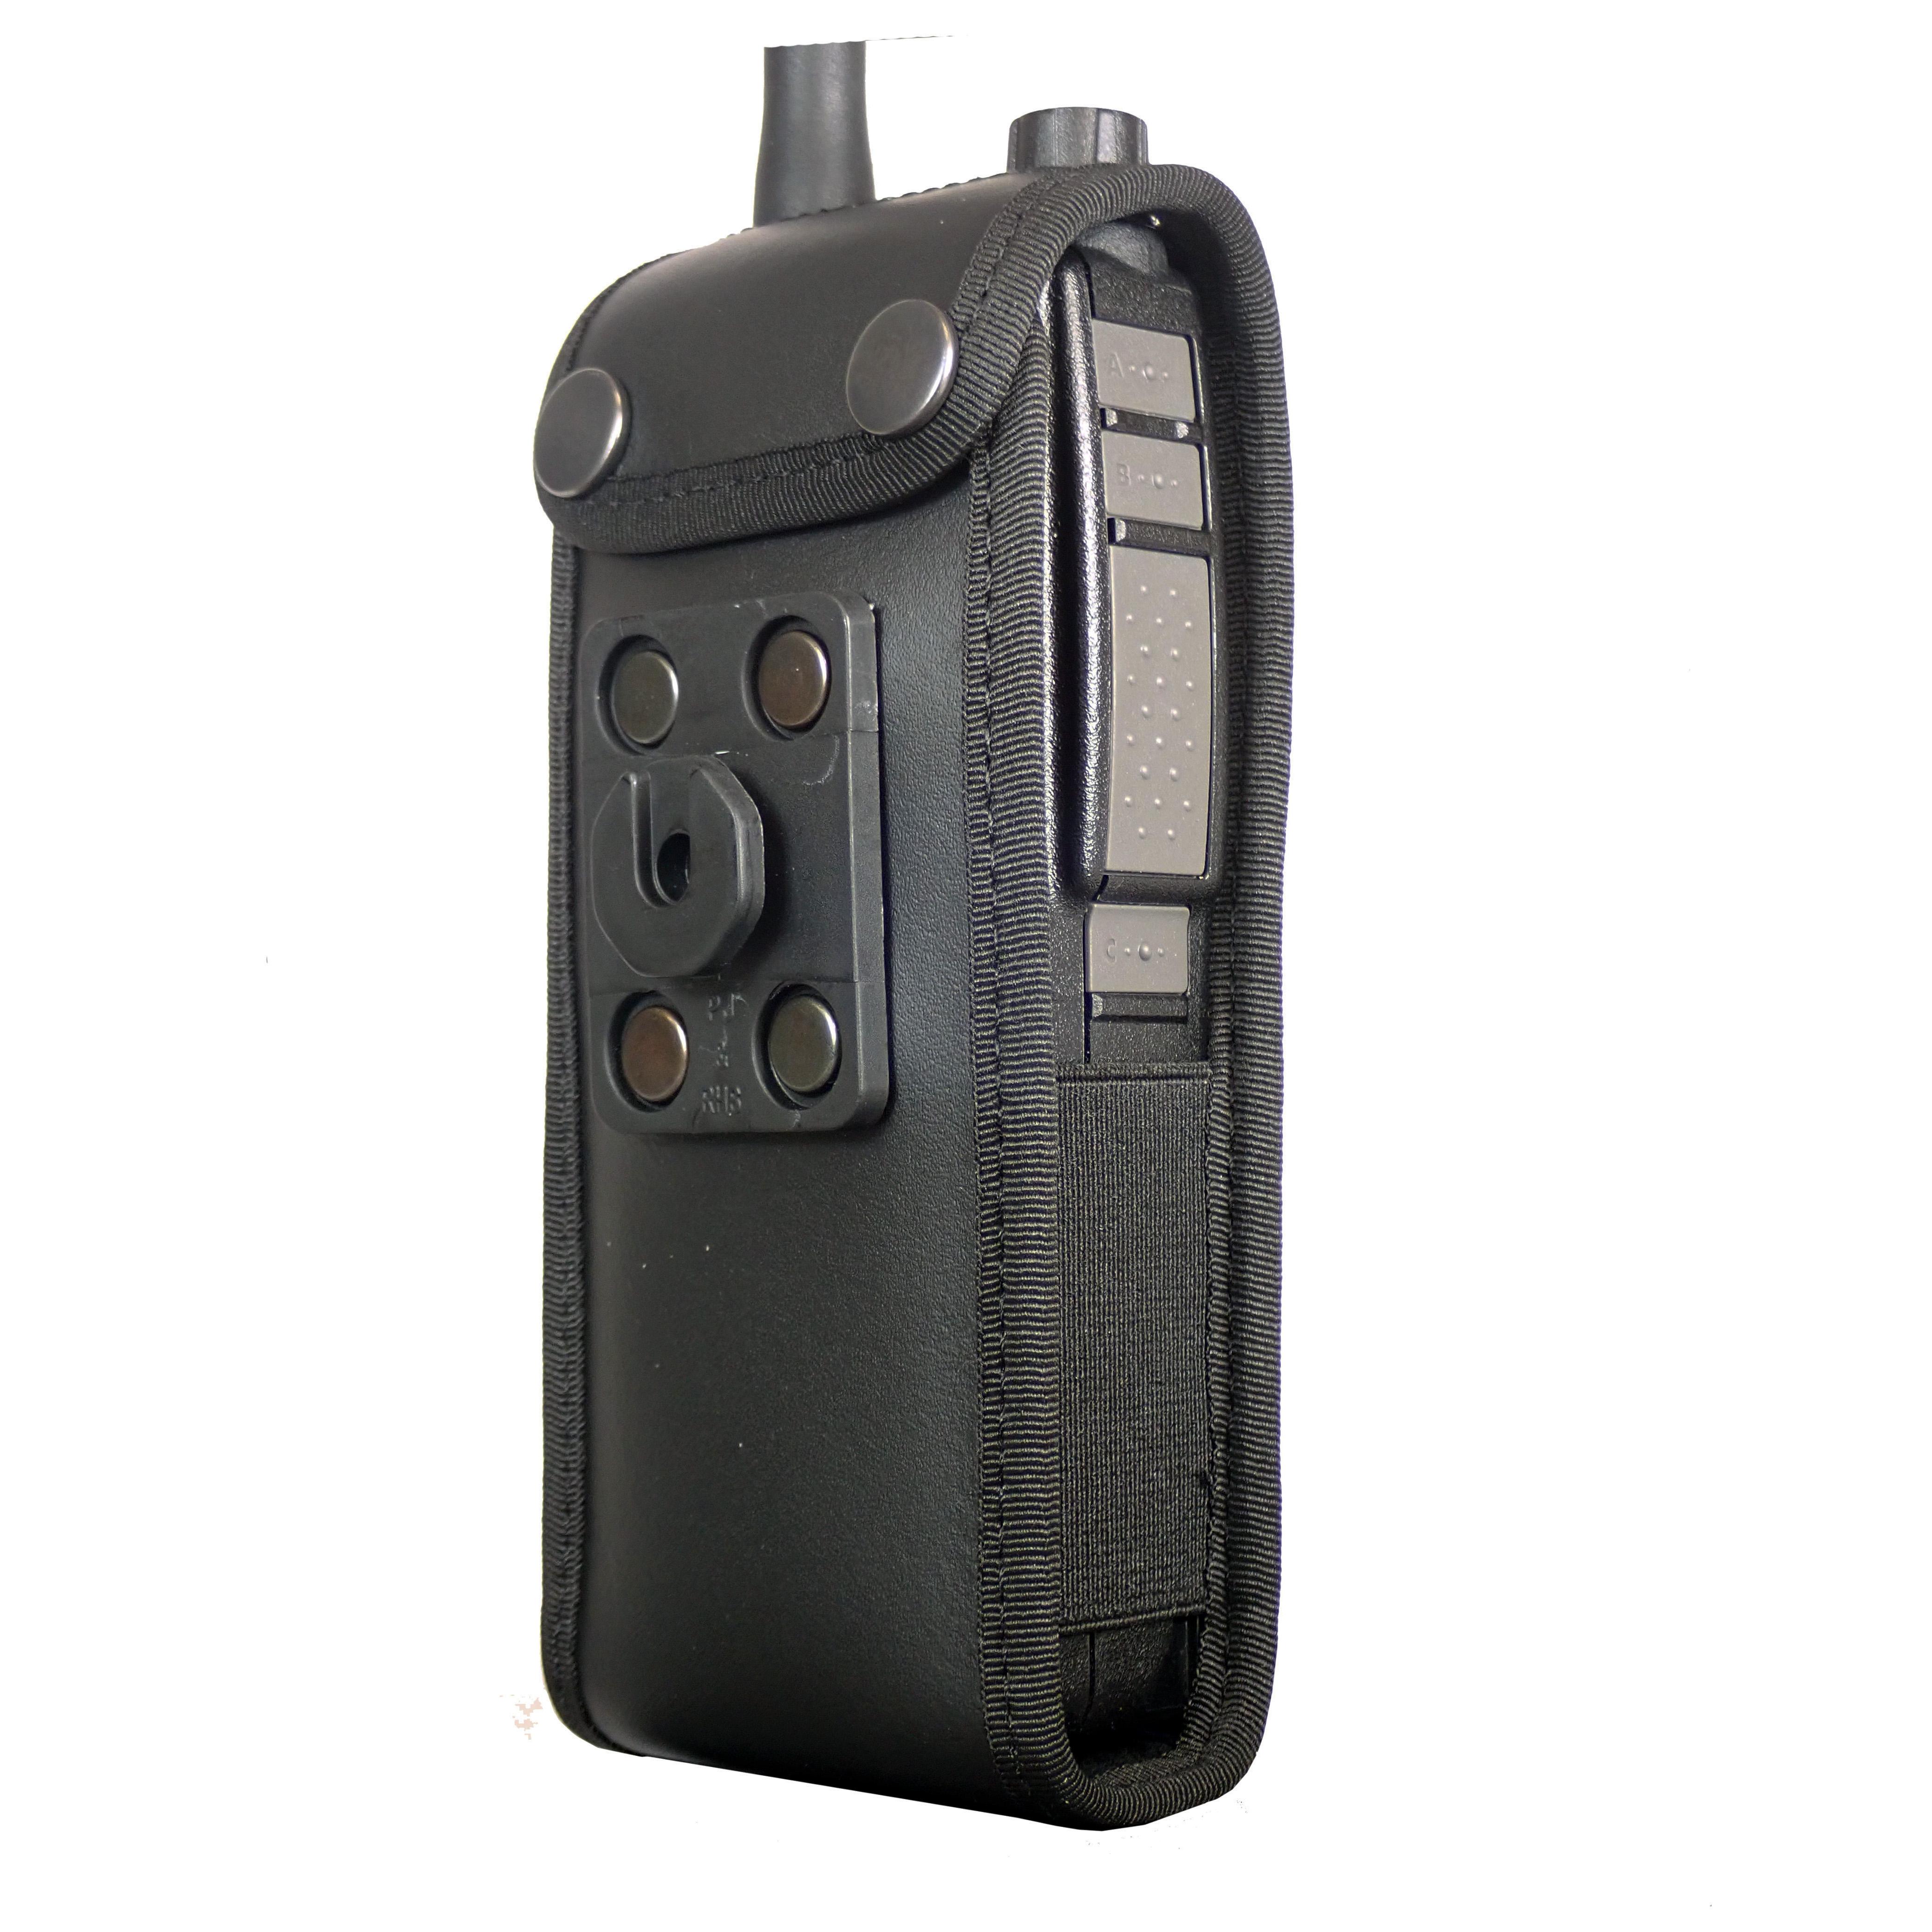 Sepura SC2020 Tetra leather radio case with Click-On